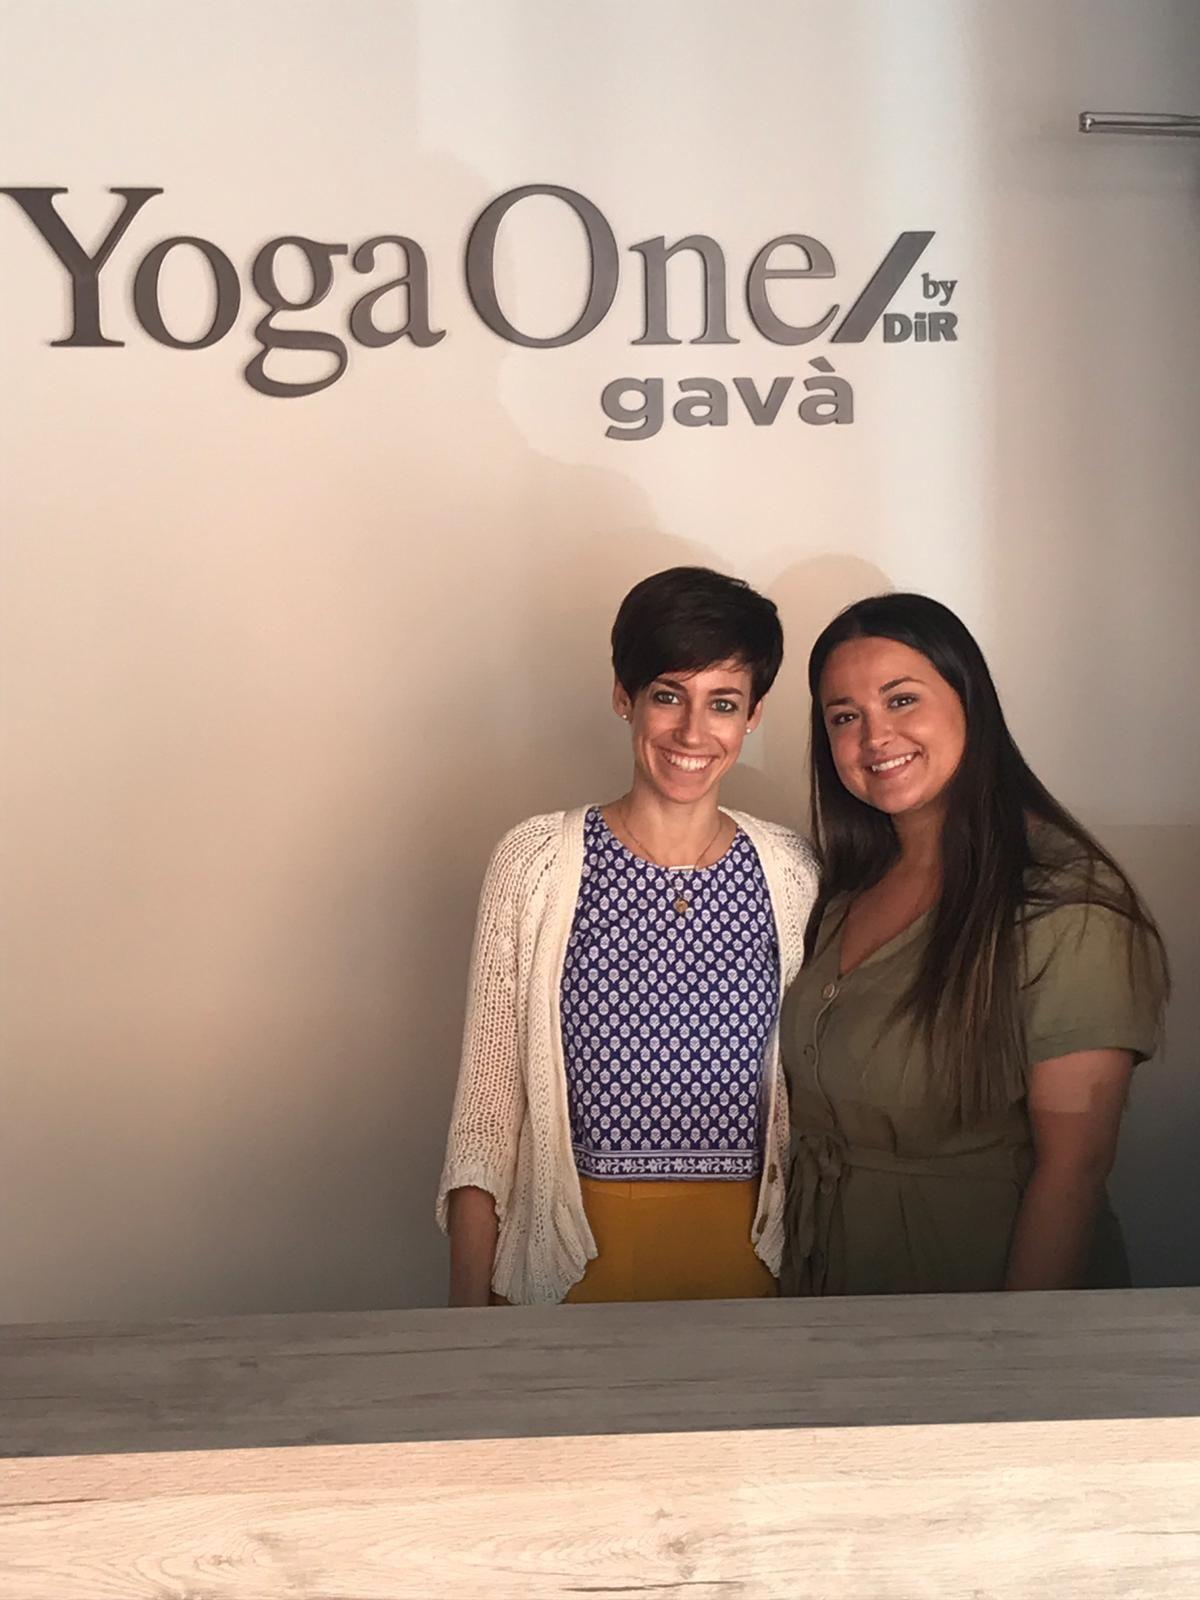 Yogaone Gavà Centro De Yoga Clase De Yoga Estilos De Yoga